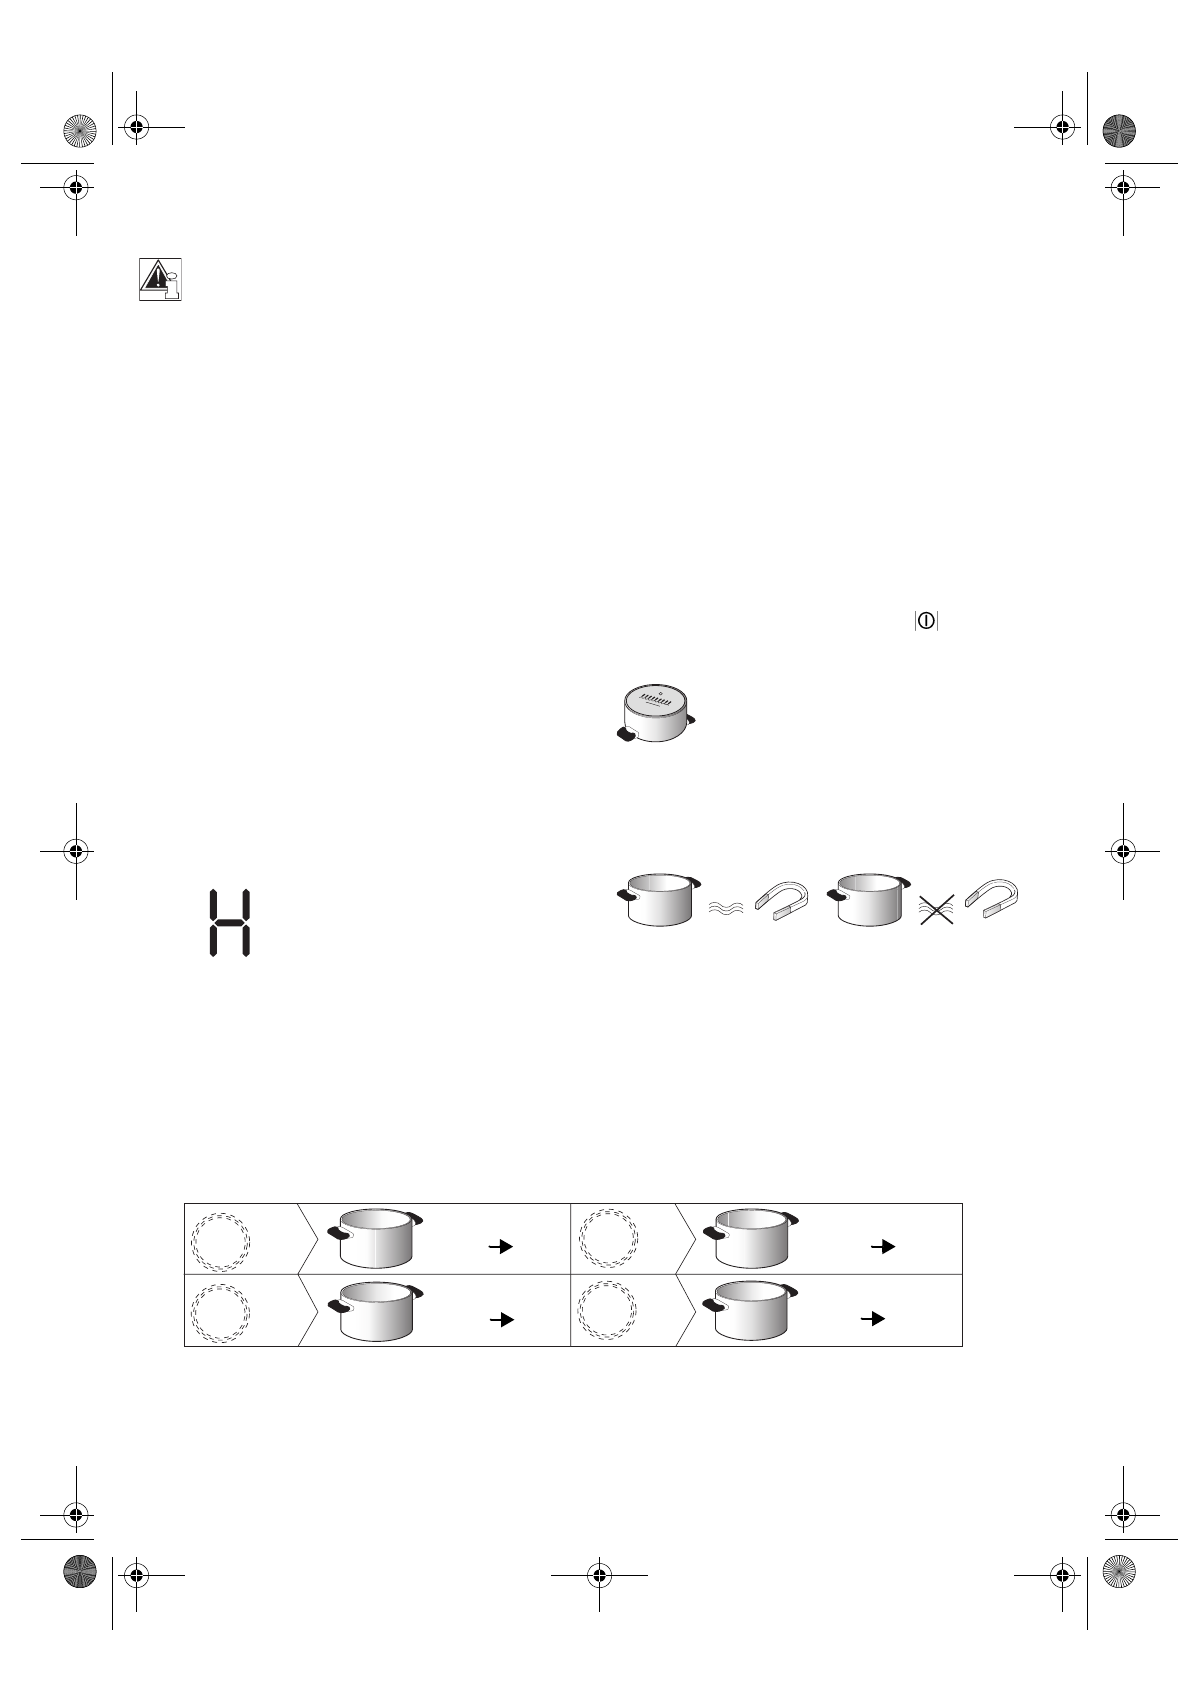 handleiding ikea nutid hin4t pagina 1 van 7 english rh gebruikershandleiding com Word Manual Guide Clip Art User Guide